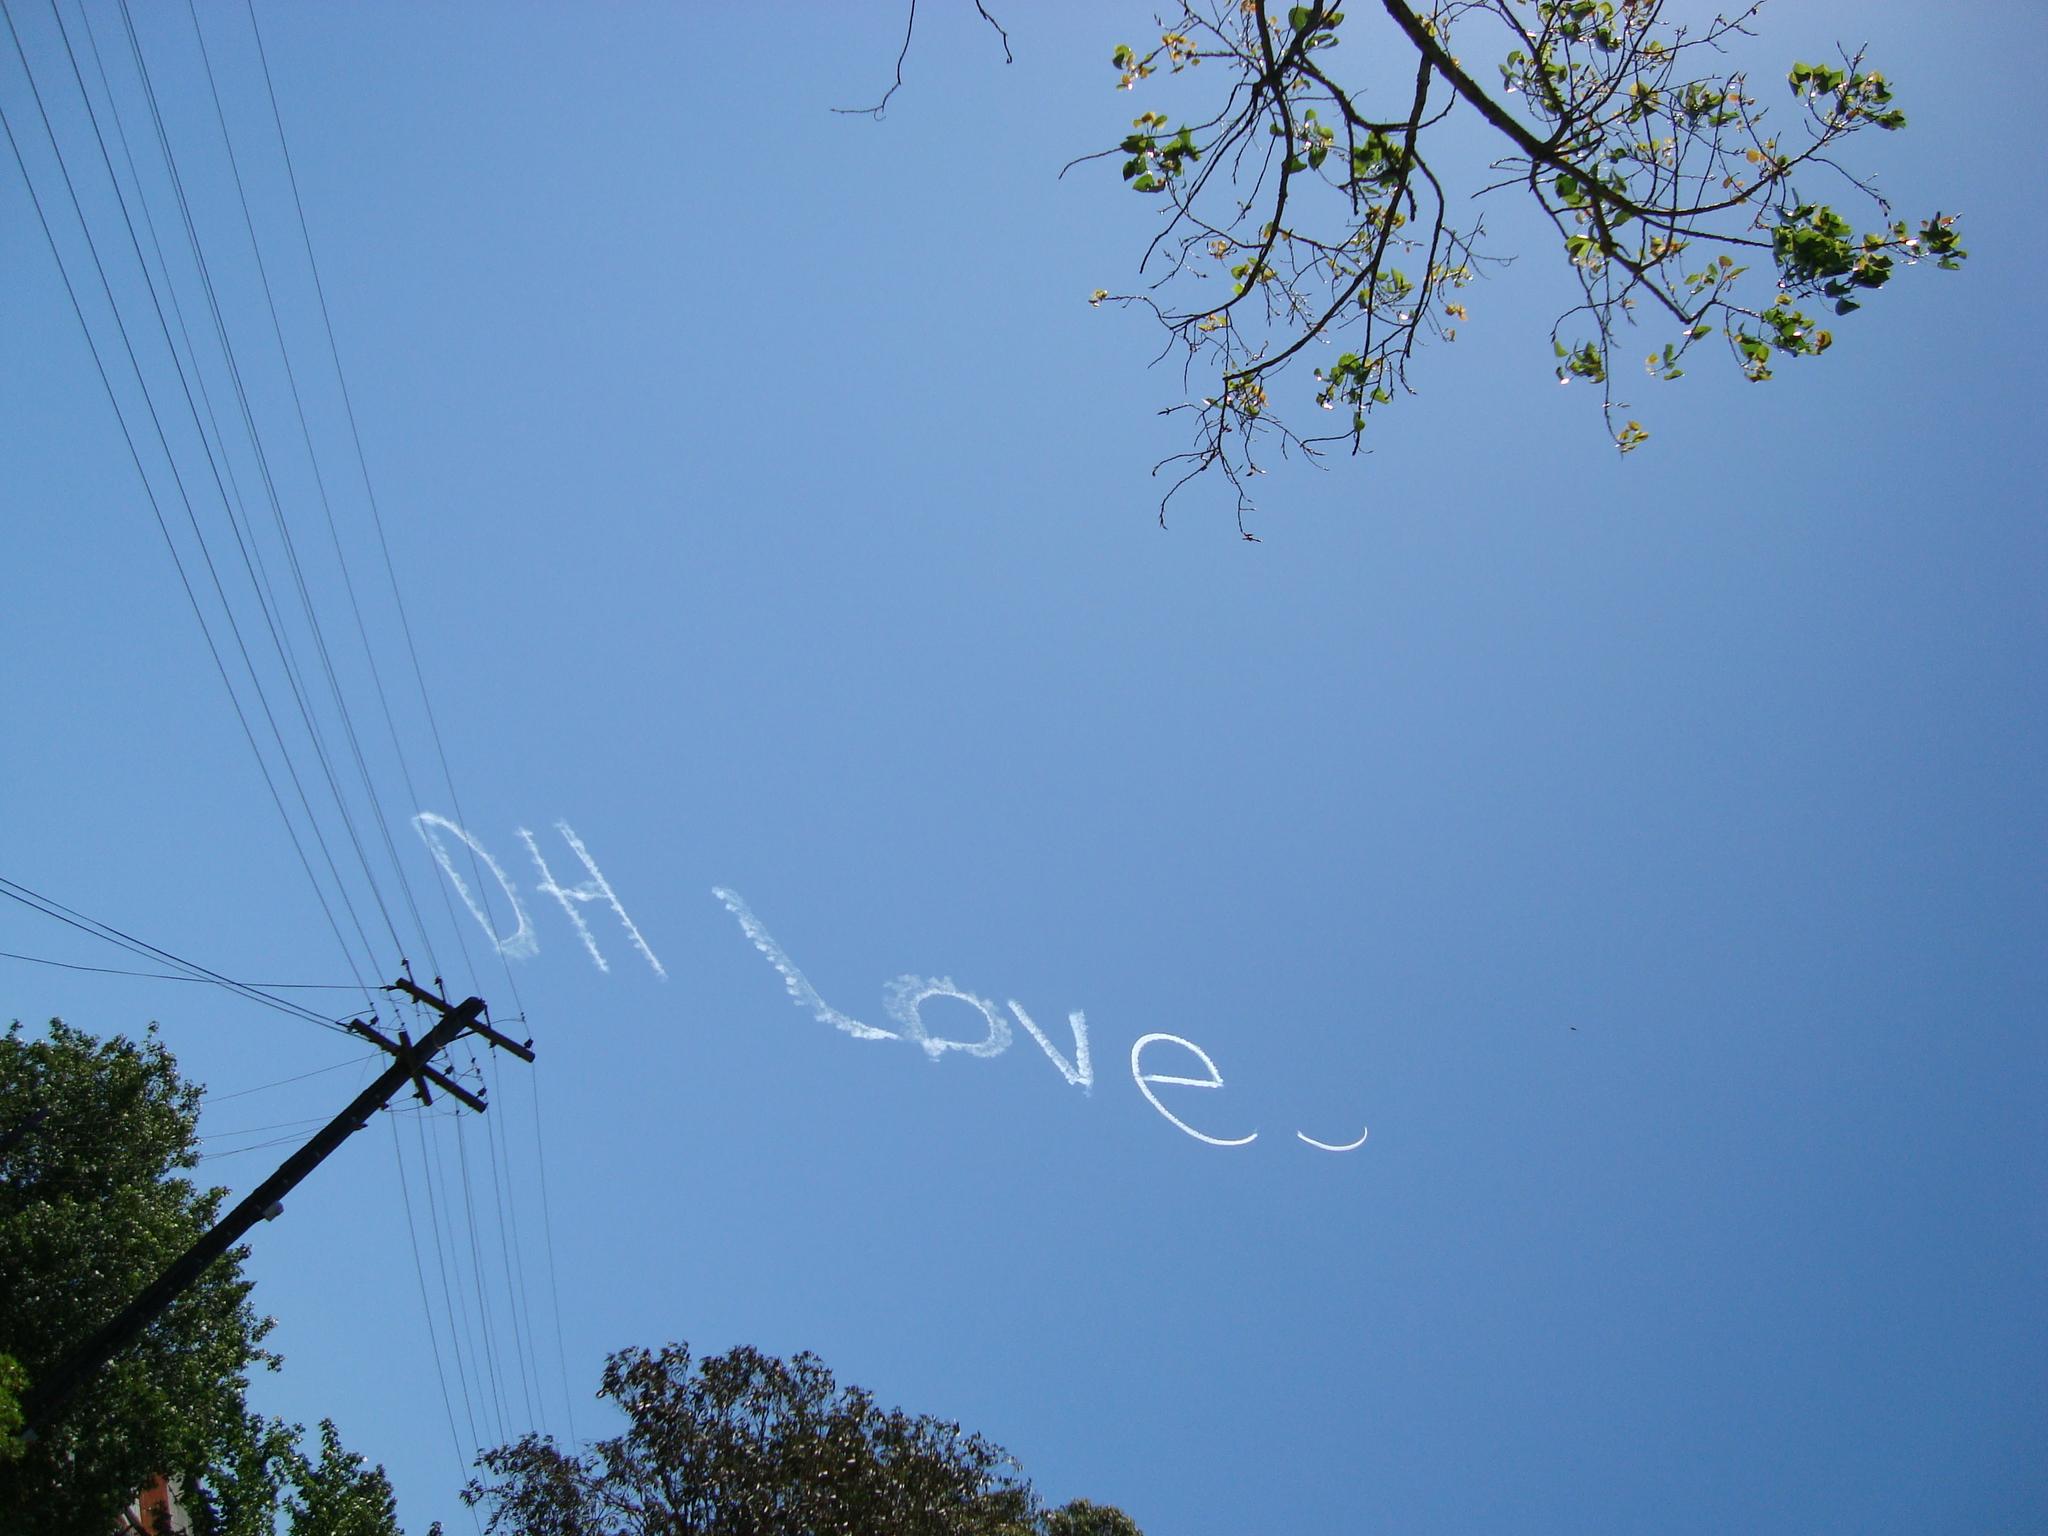 DH Loves